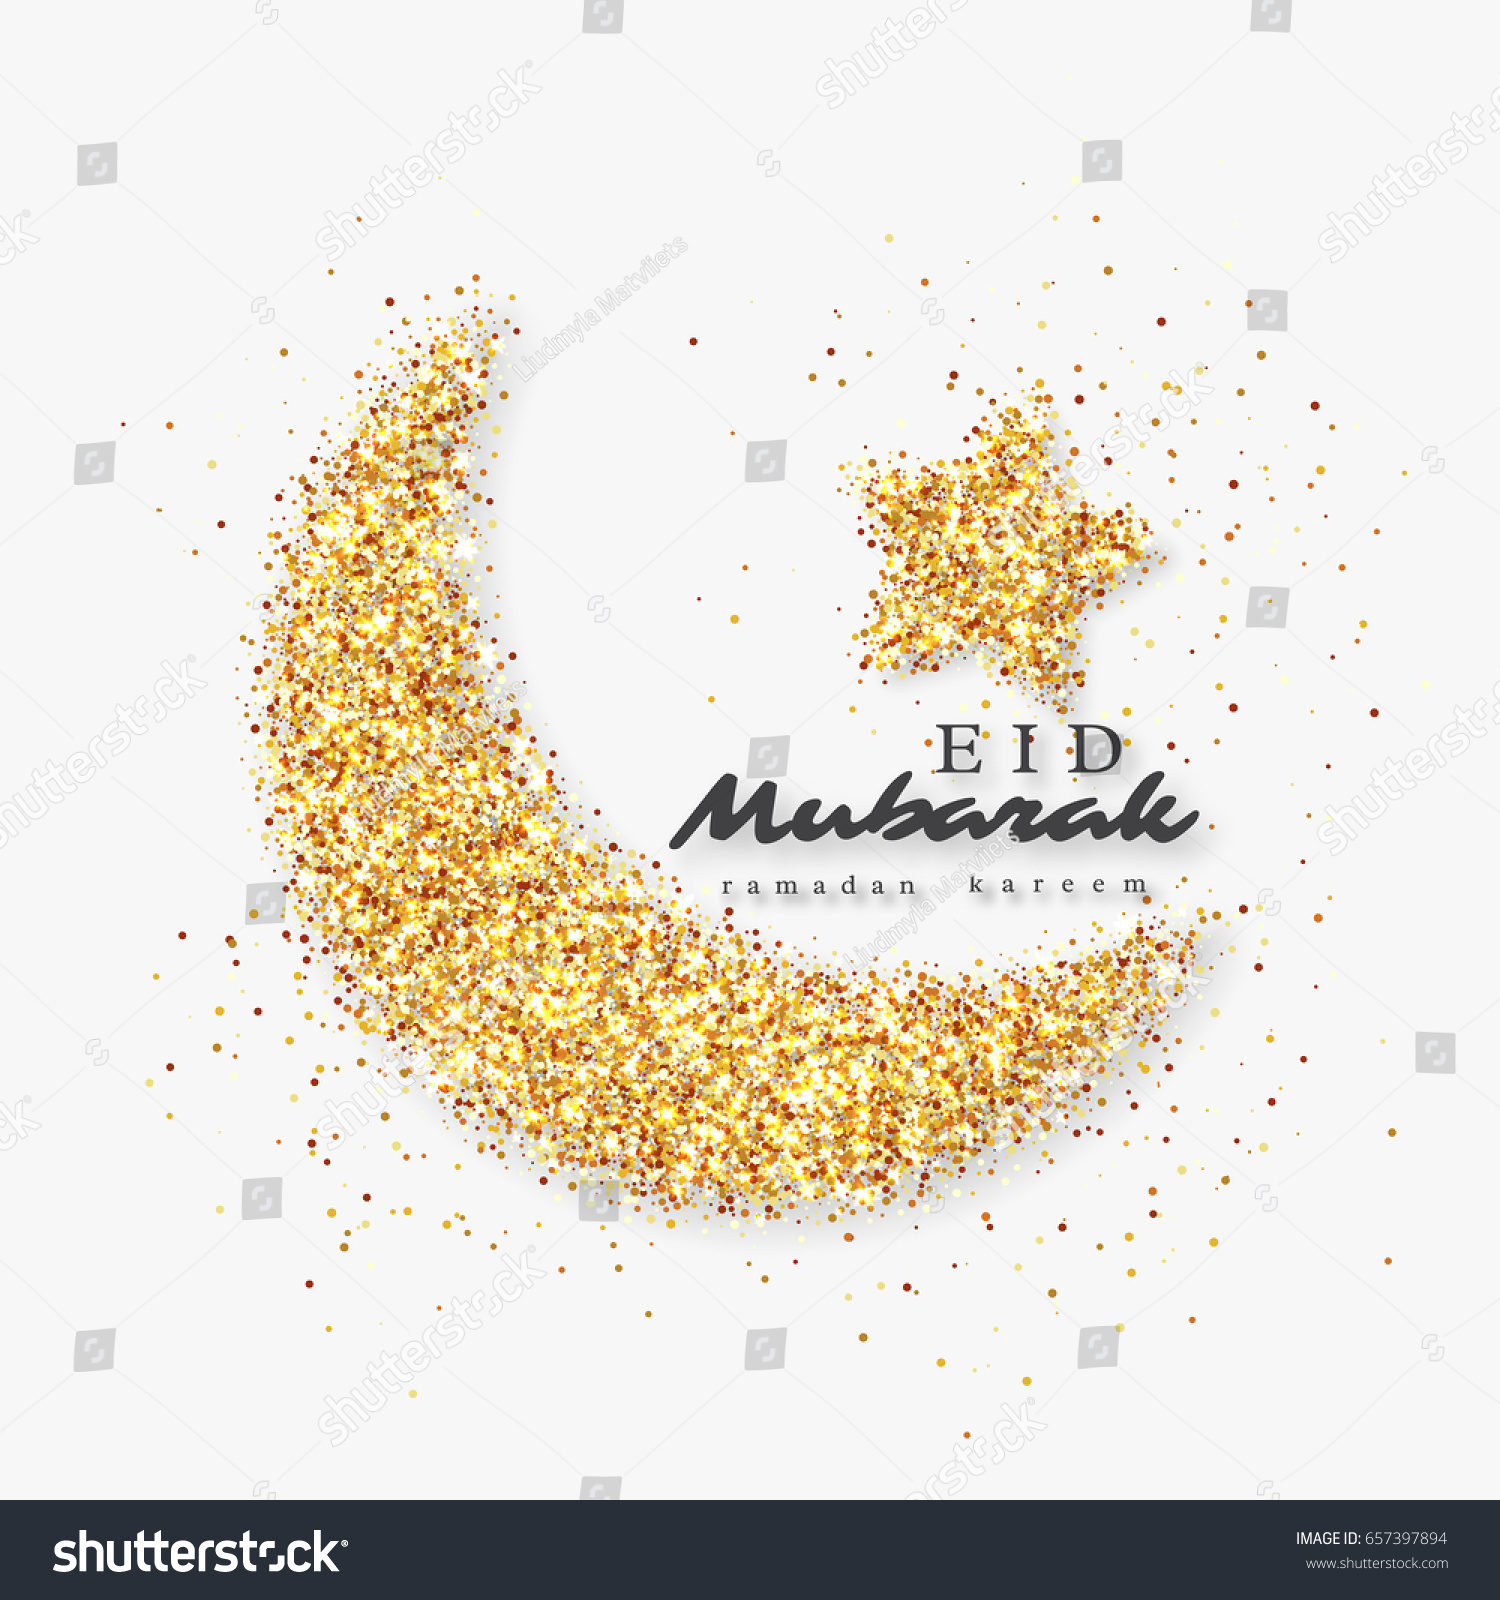 Eid Mubarak Glitter Holiday Design Glowing Stock Vector Royalty Free 657397894